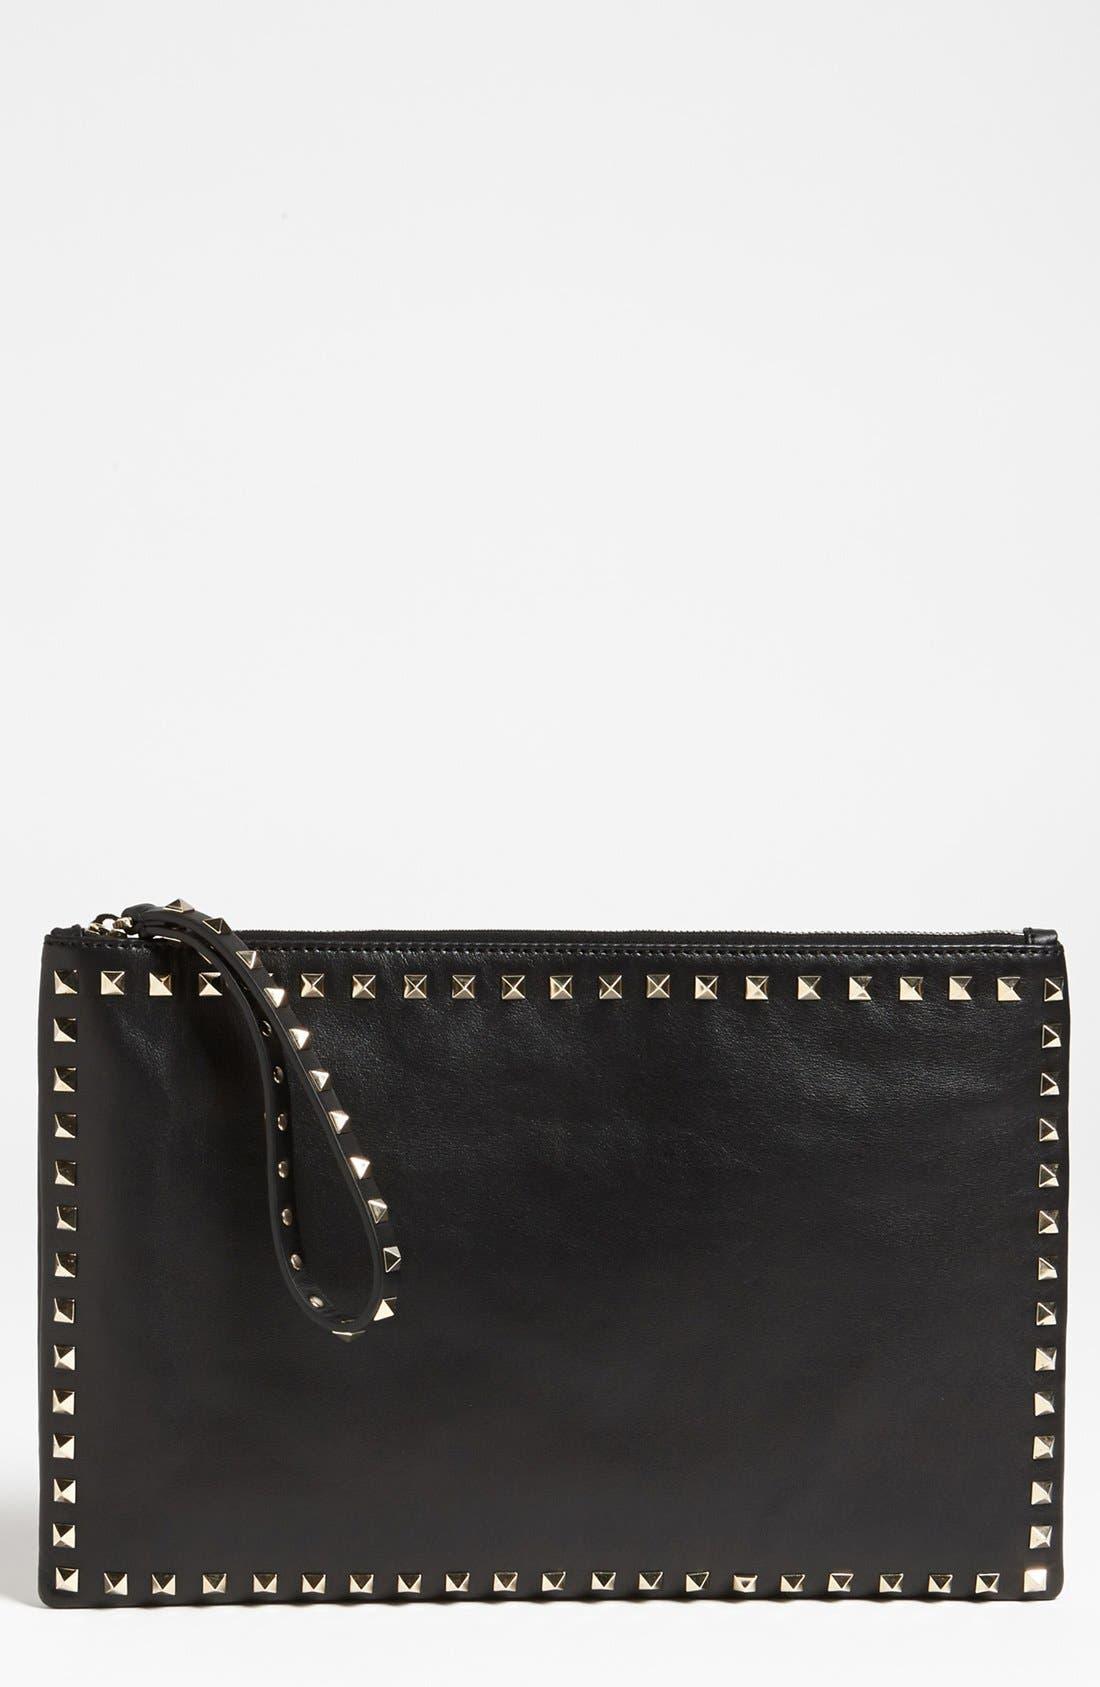 Main Image - Valentino 'Rockstud - Flat' Leather Clutch